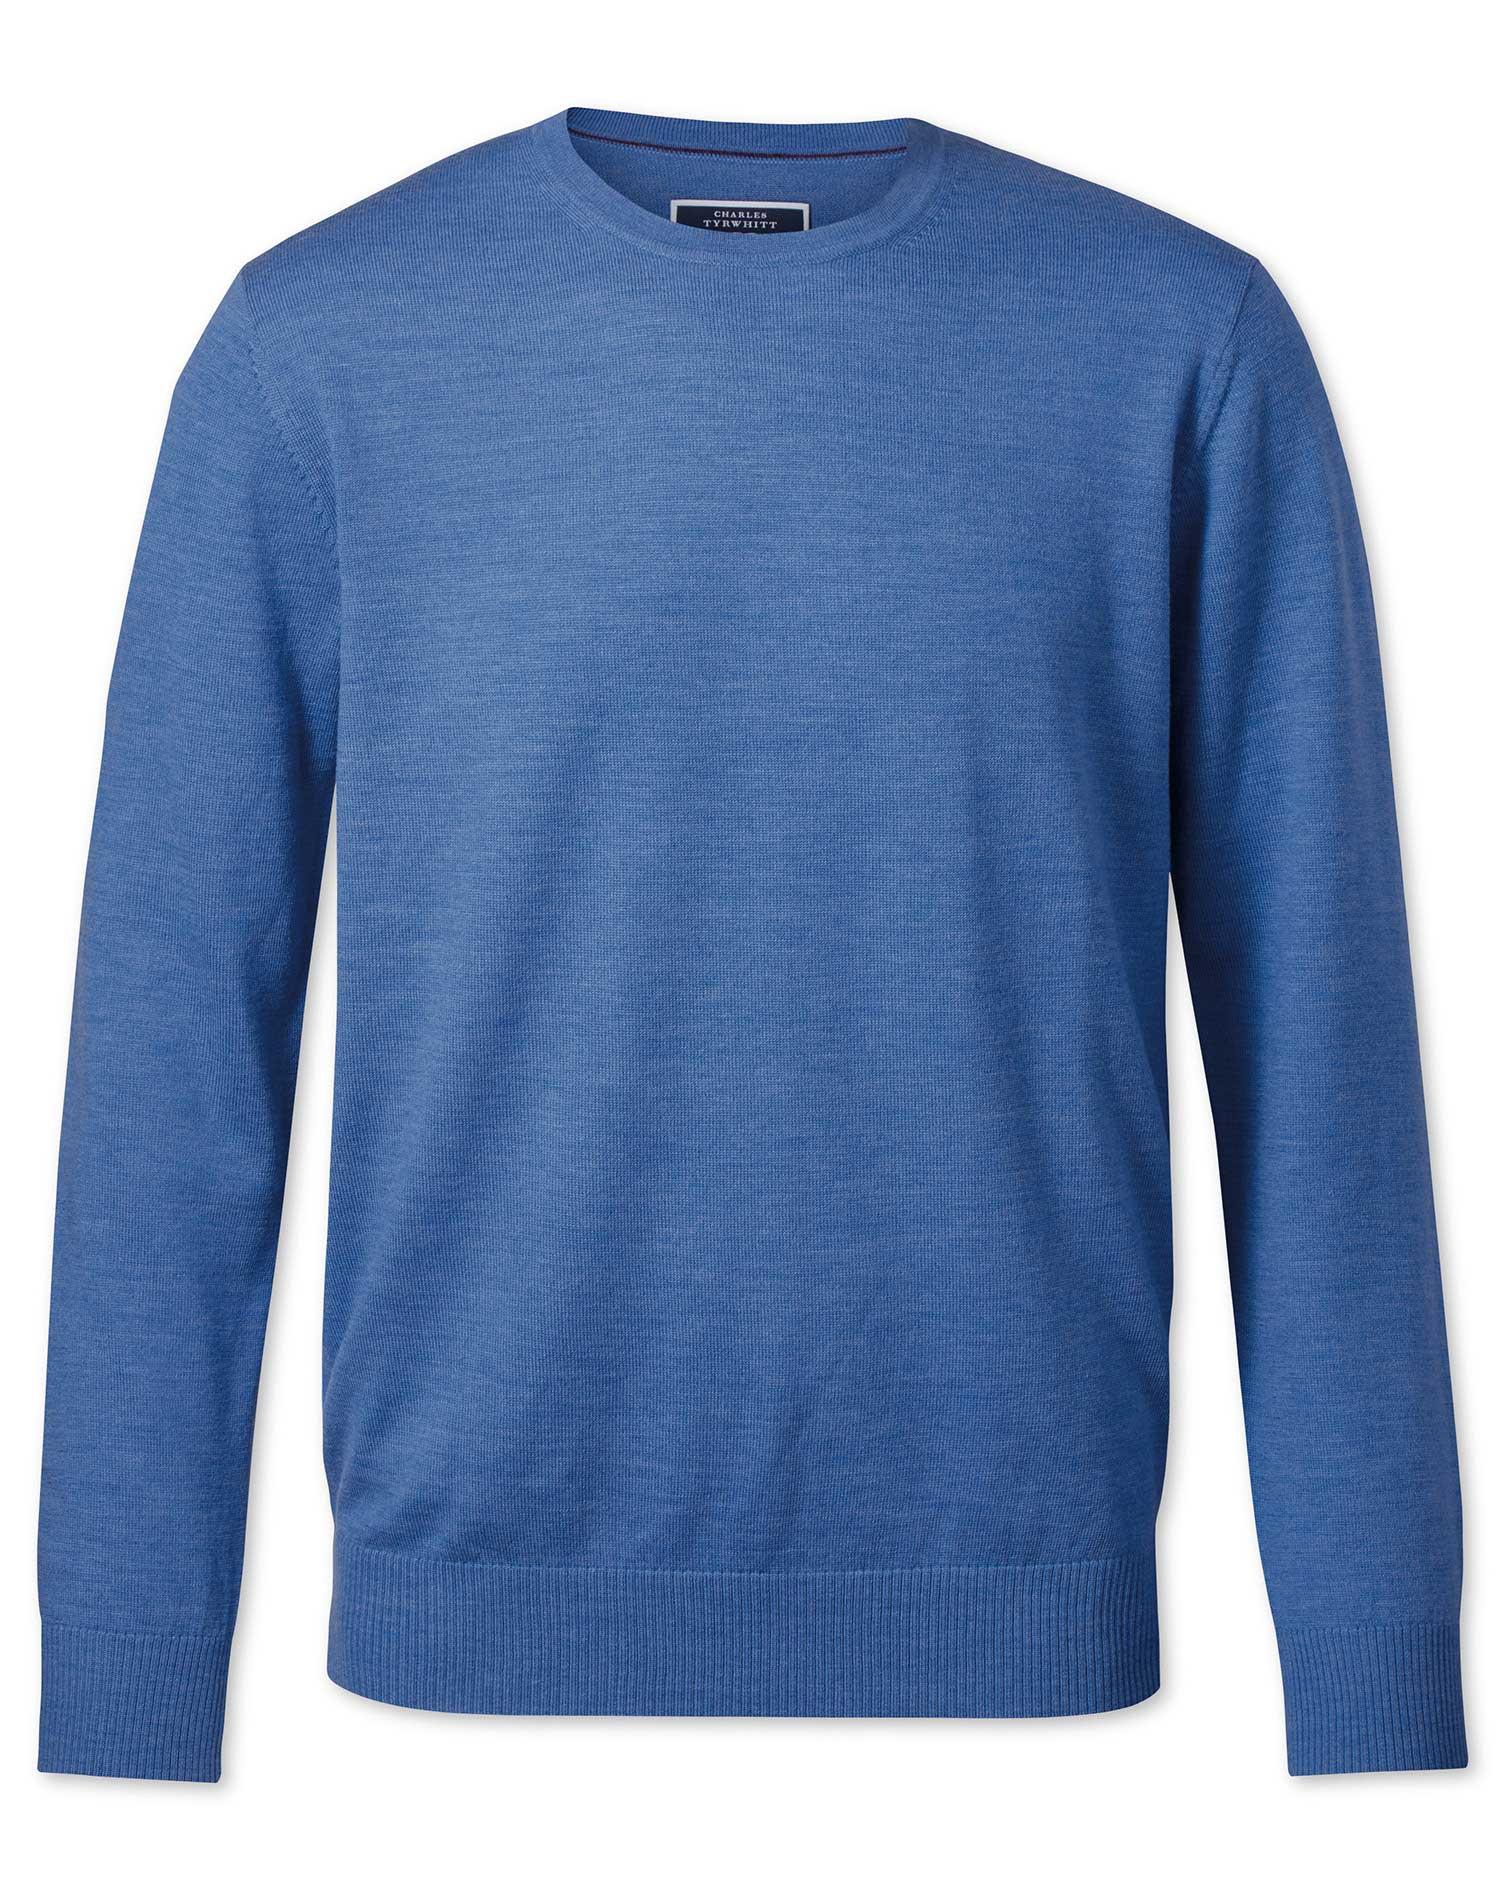 Blue Merino Wool Crew Neck Jumper Size Large by Charles Tyrwhitt